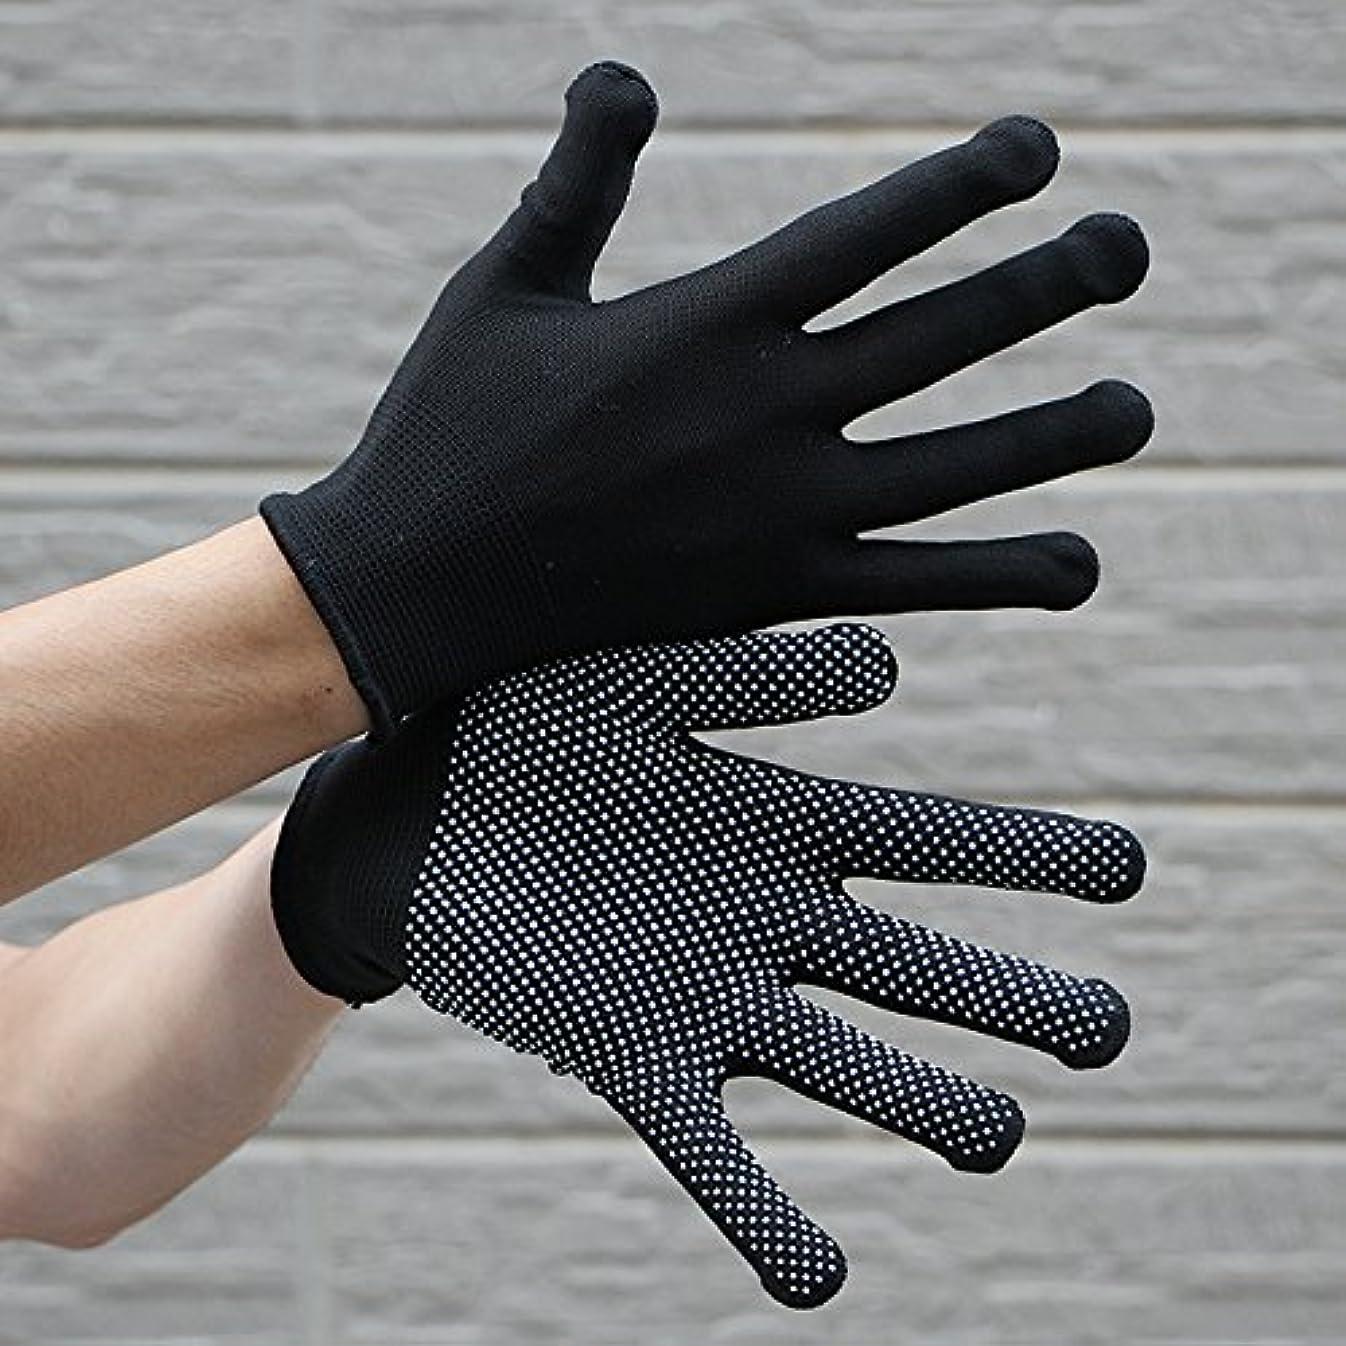 VBMDoM 白いPVCの点線、黒いナイロンの作業手袋、10対パック [並行輸入品]